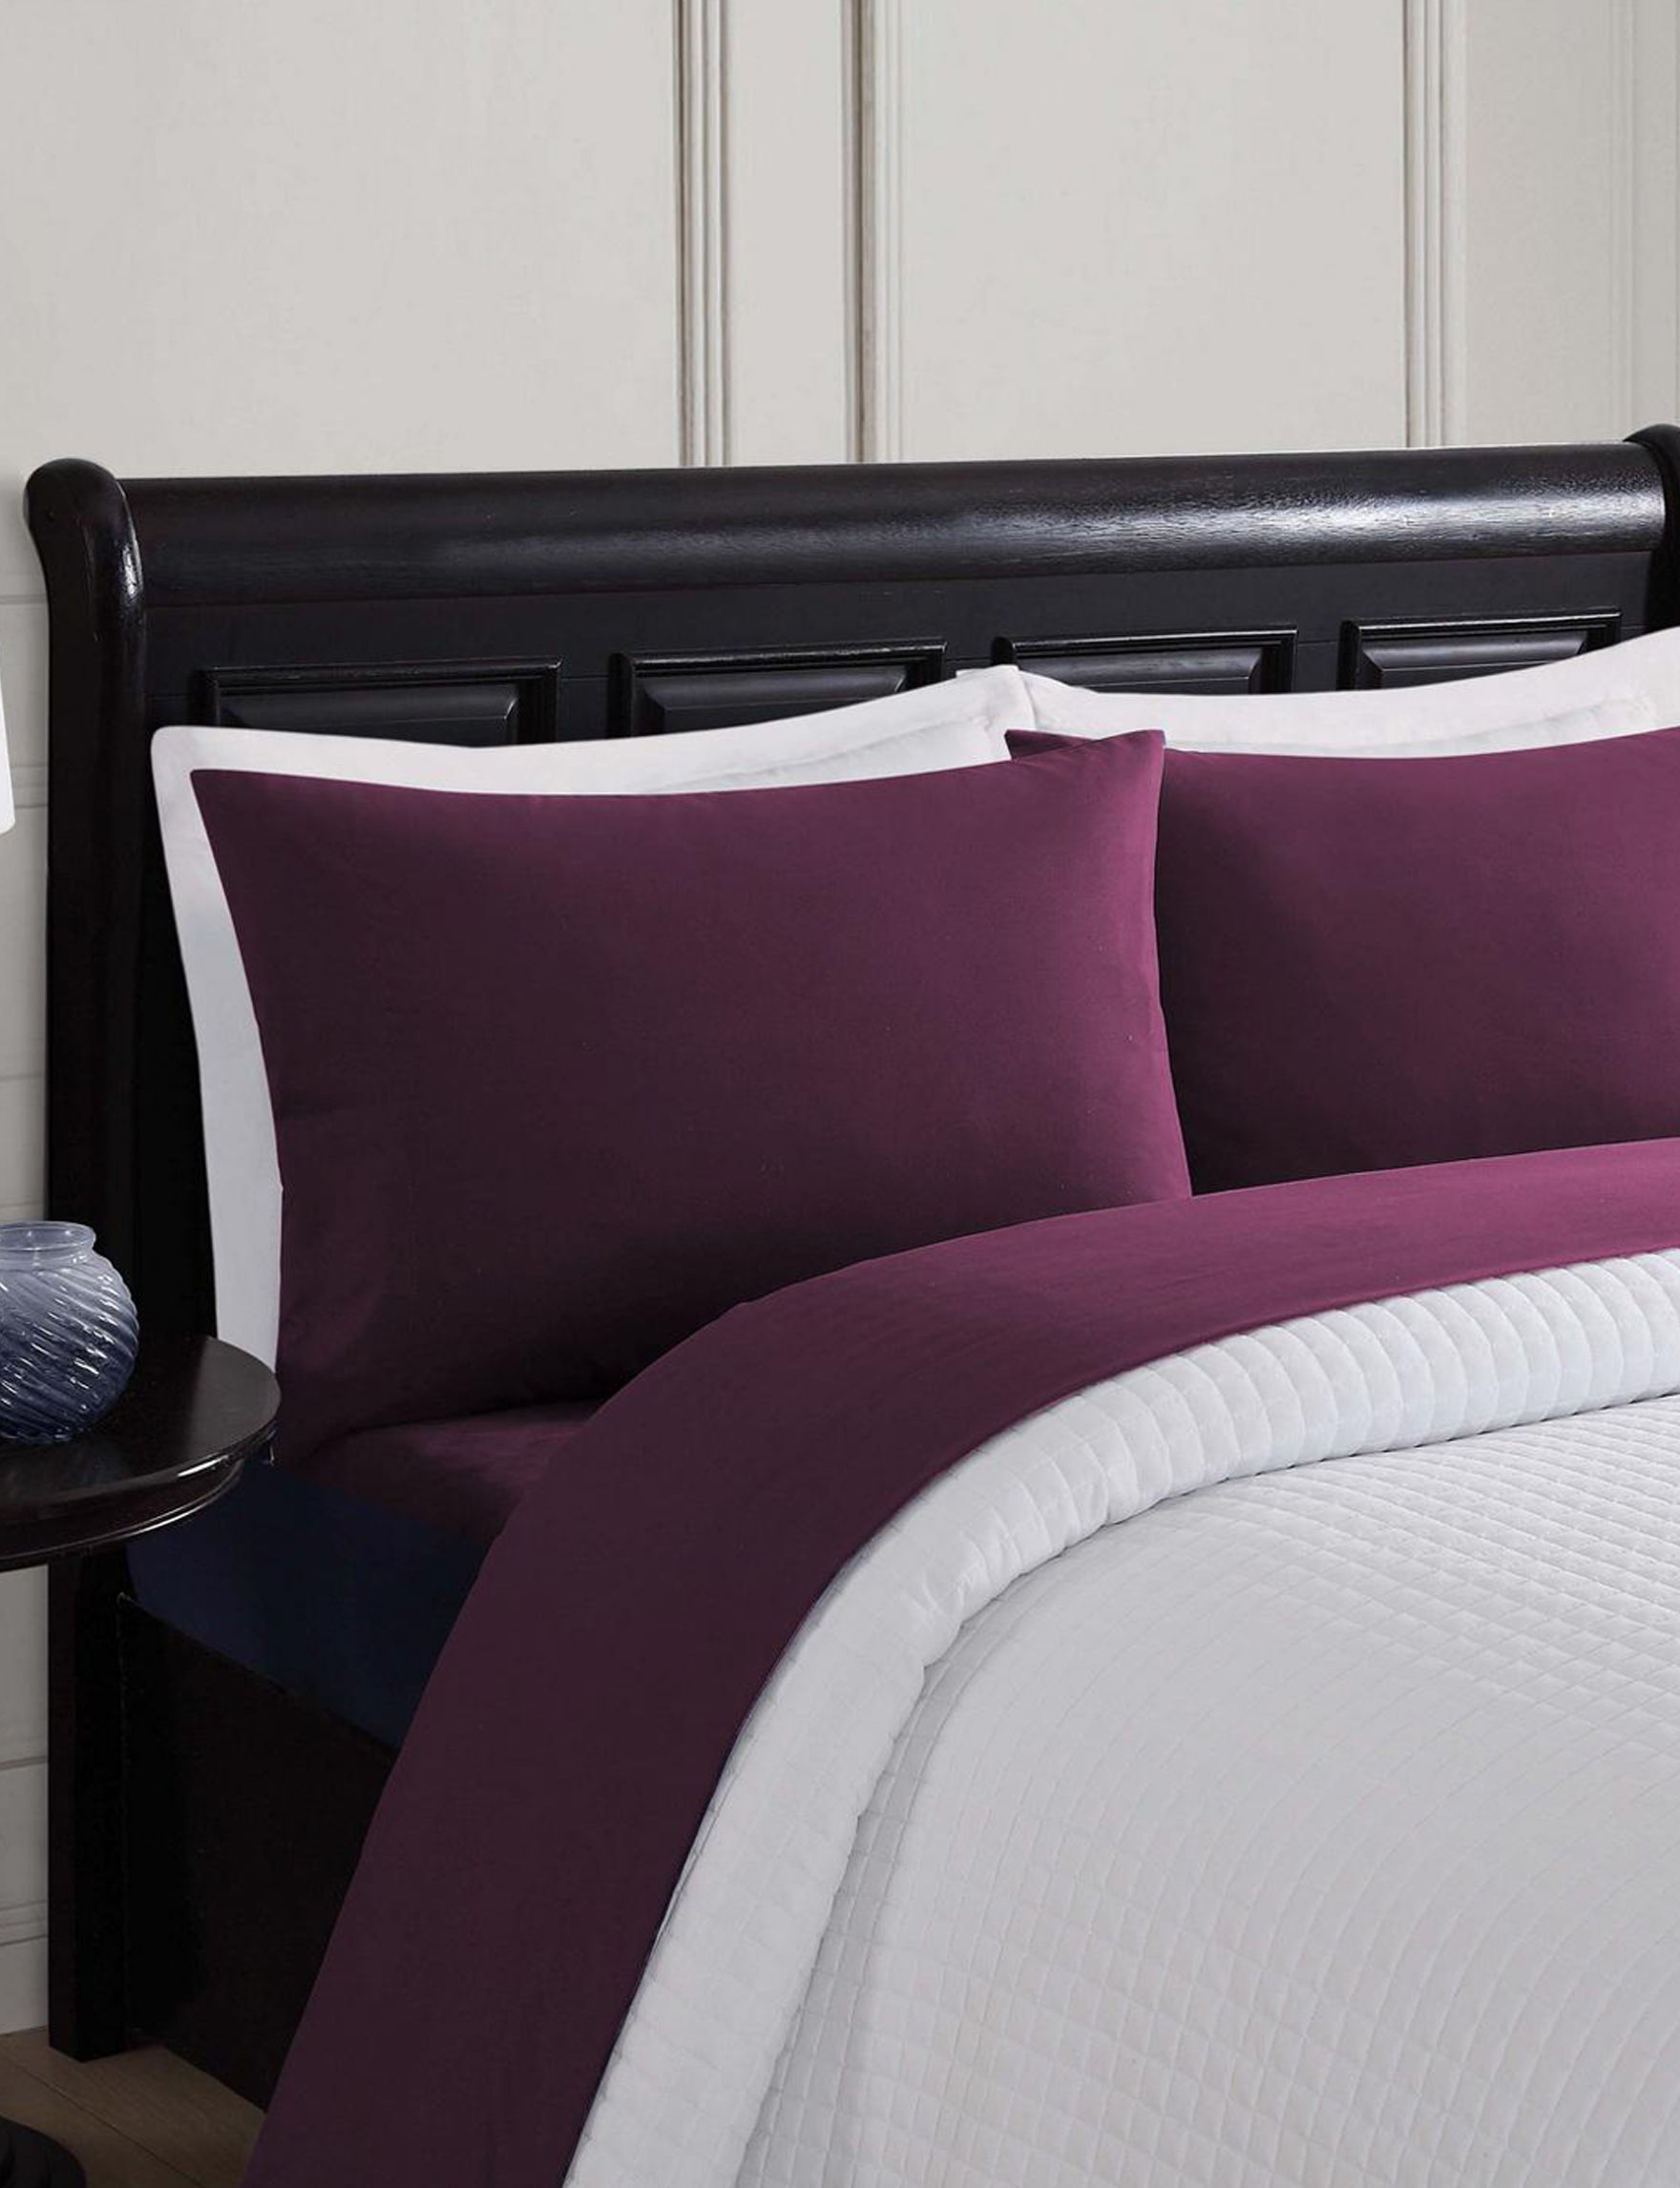 London Fog Purple Sheets & Pillowcases